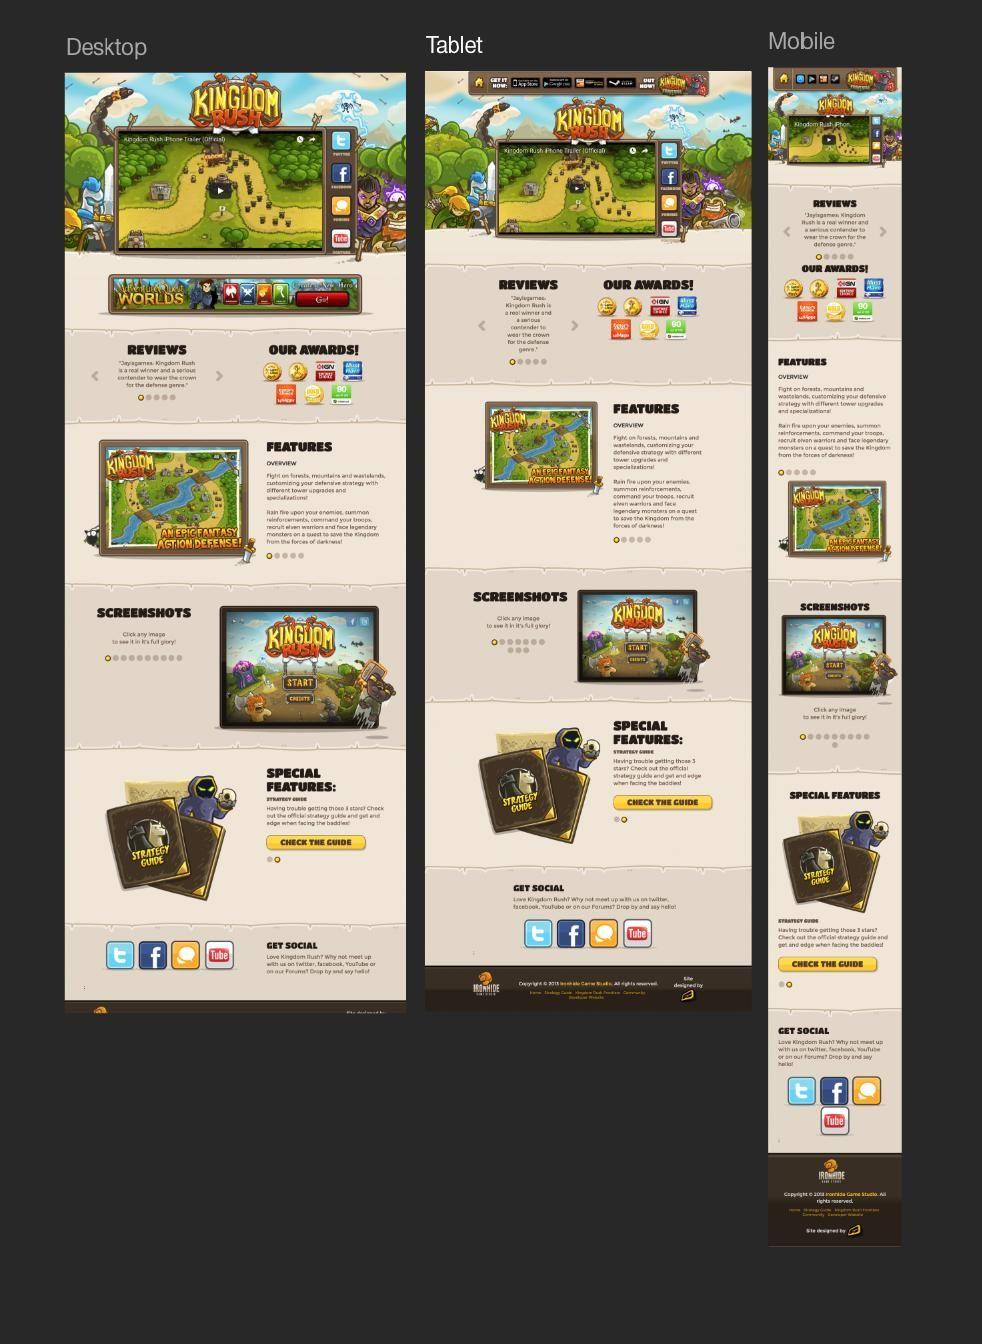 IuEjhpM.jpg (982×1344) Tablet, Screenshots, Special features